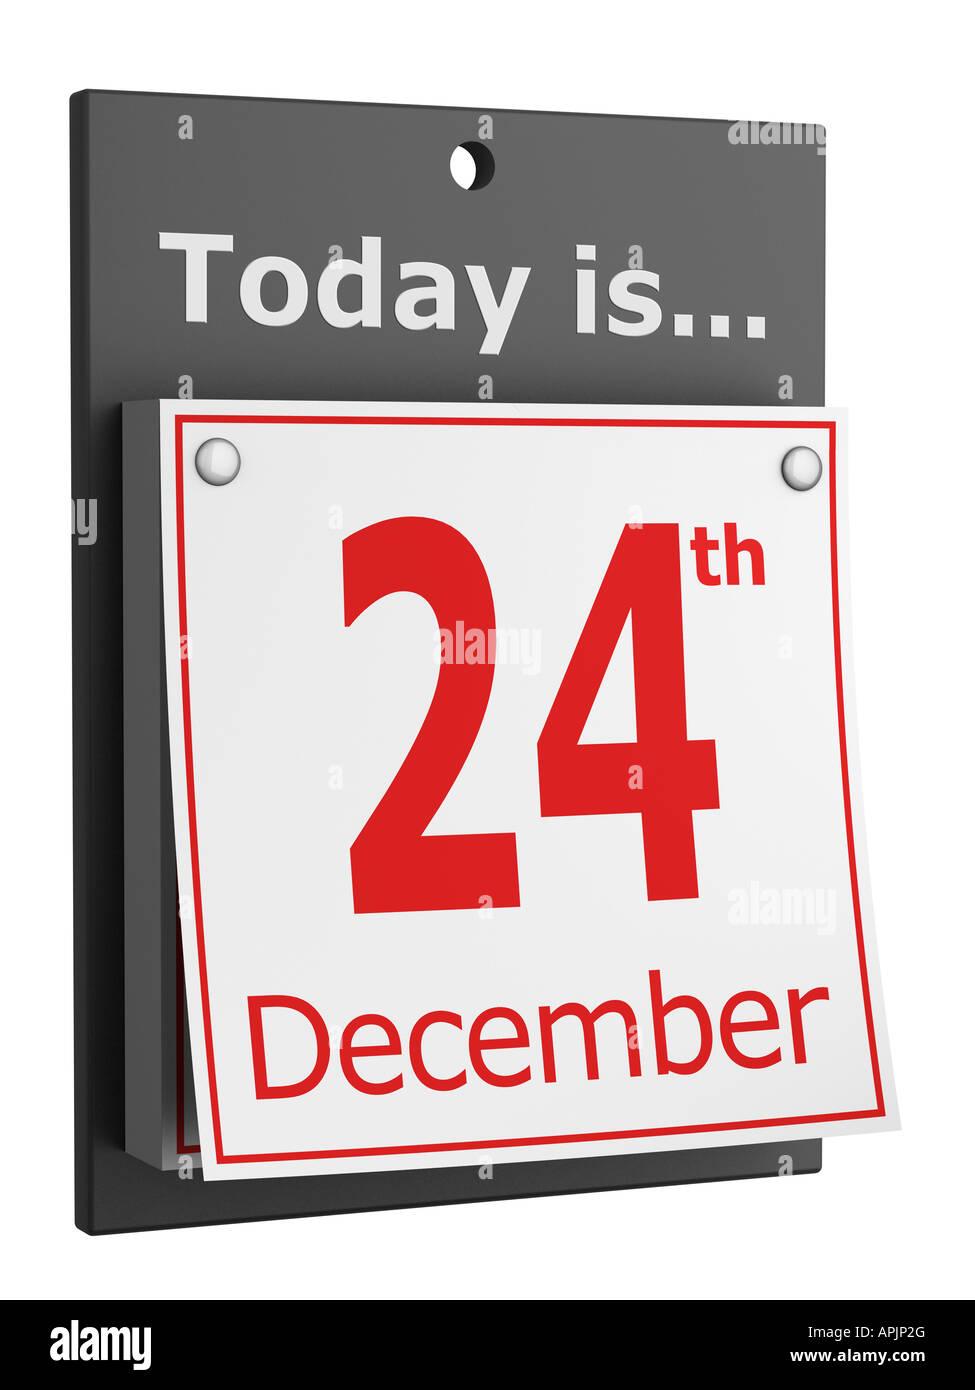 24th December Christmas Eve Stock Photo: 15806583 - Alamy